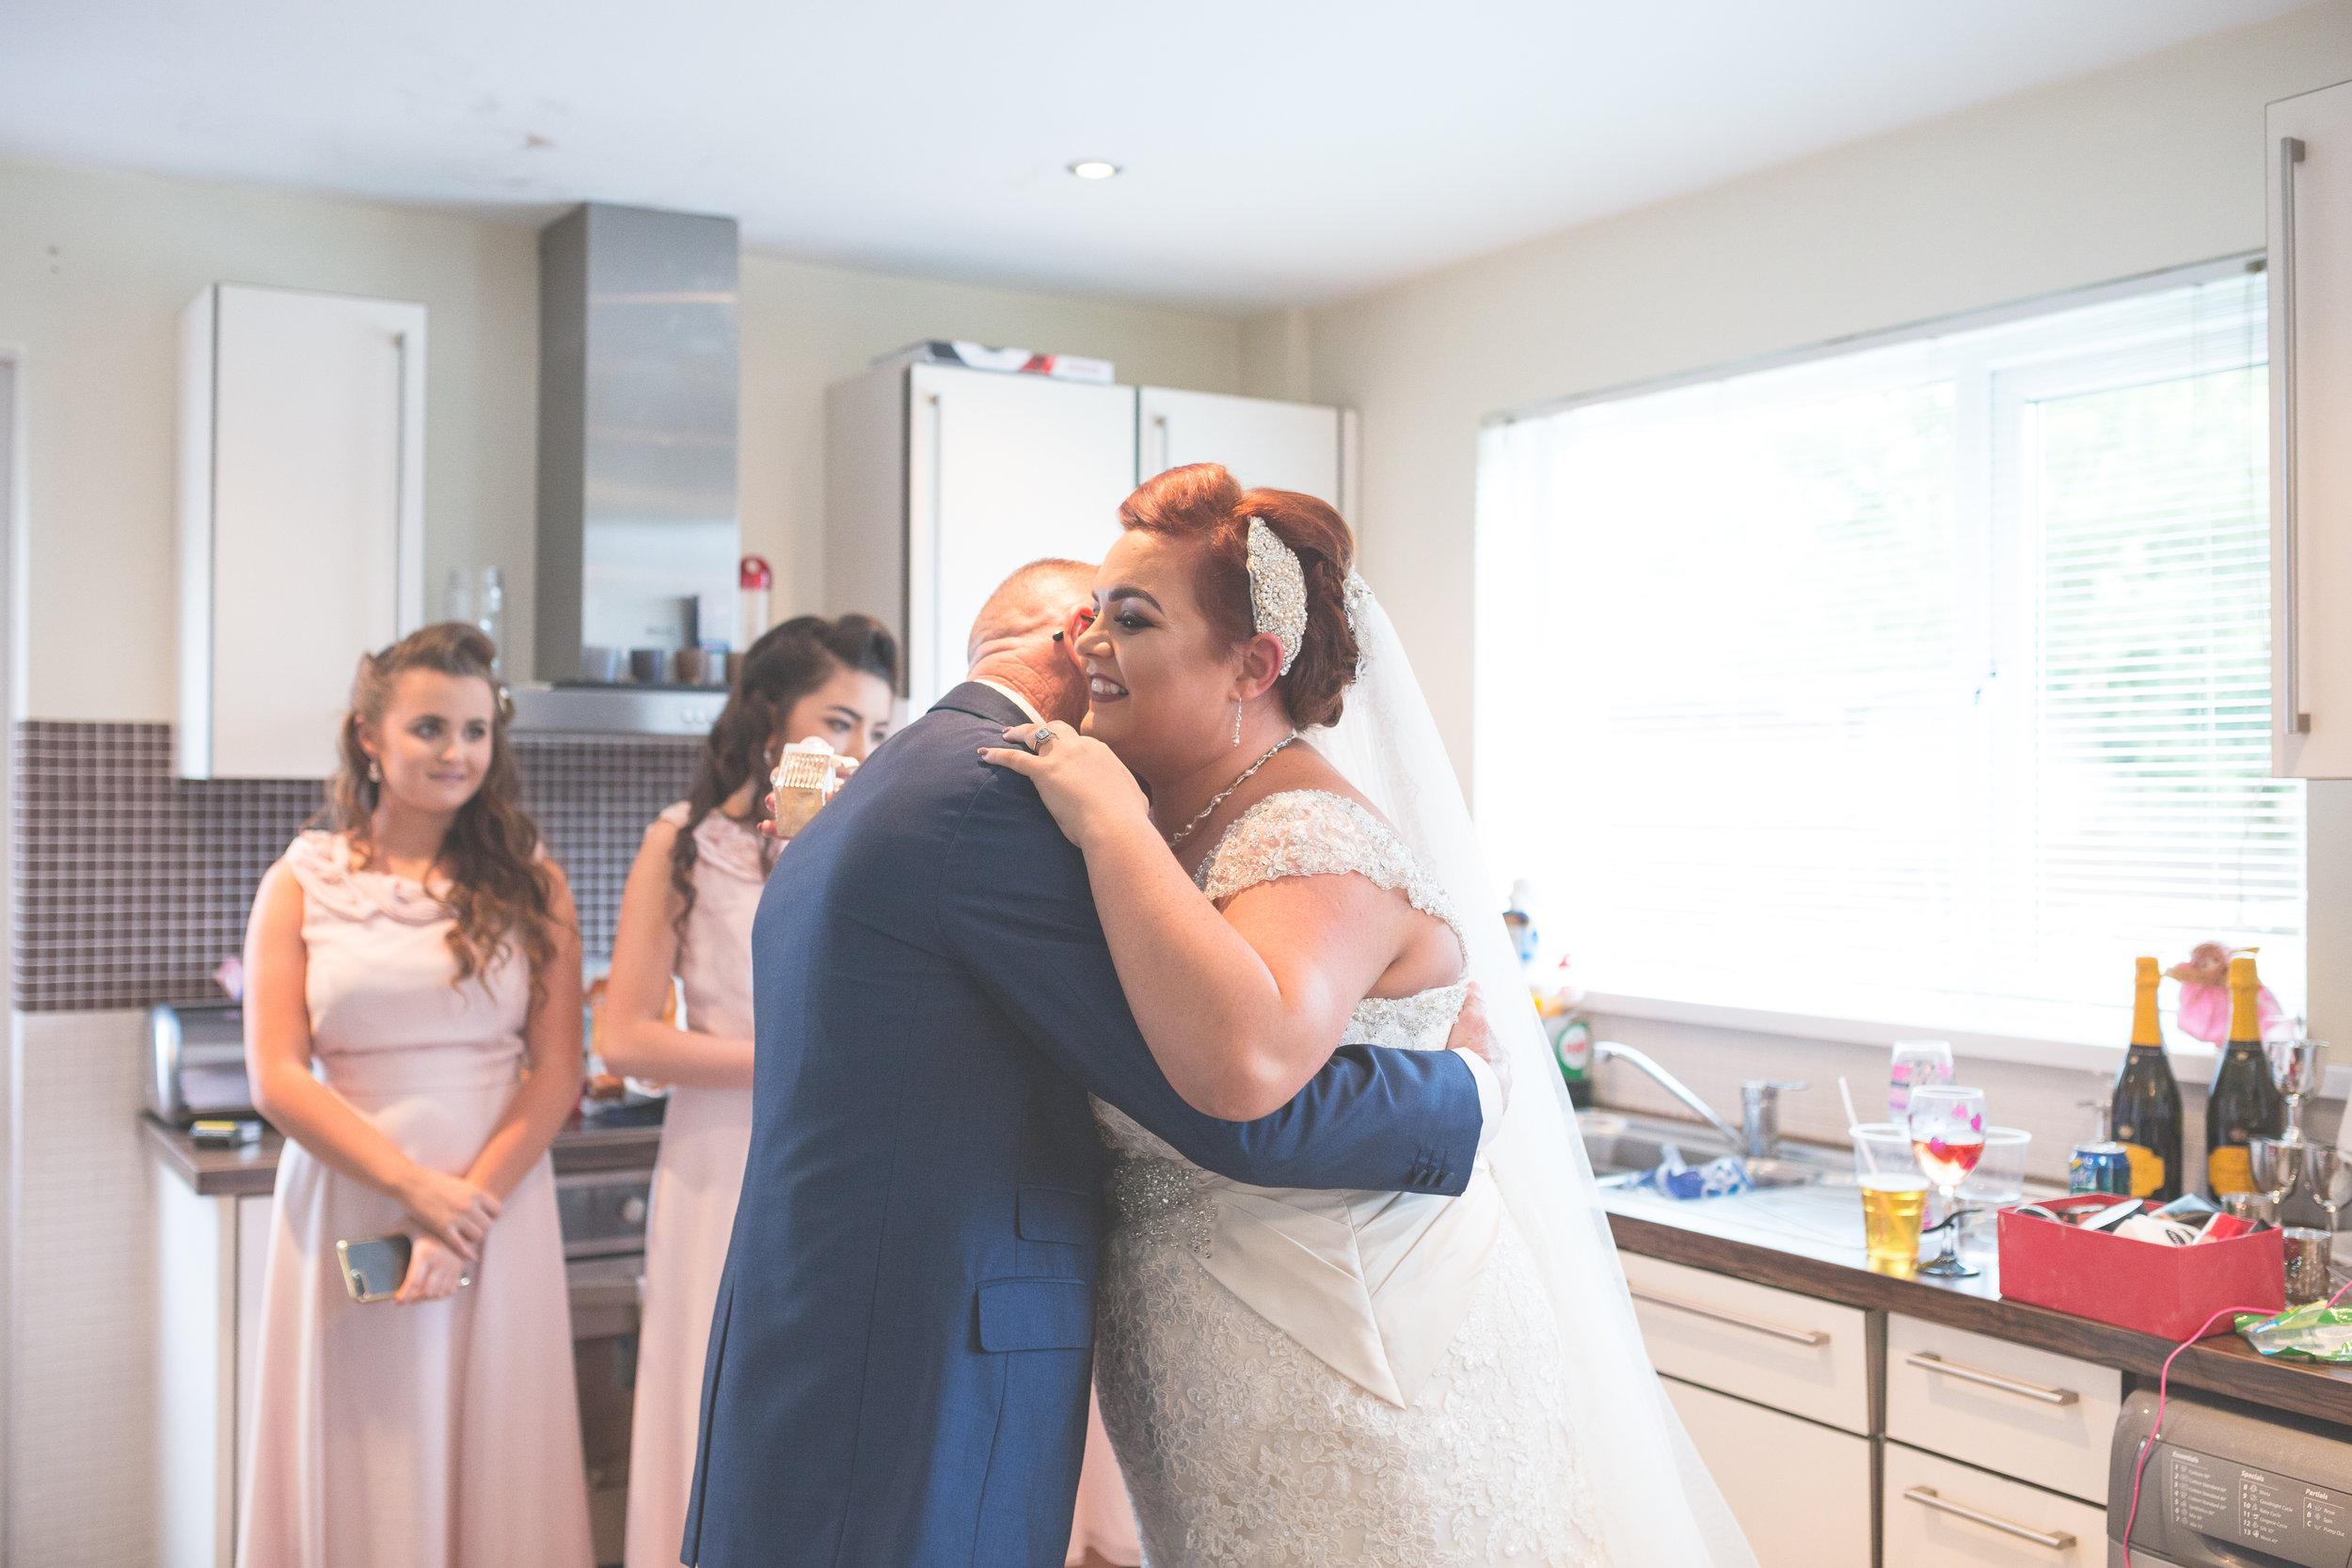 Antoinette & Stephen - Bridal Preparations | Brian McEwan Photography | Wedding Photographer Northern Ireland 183.jpg